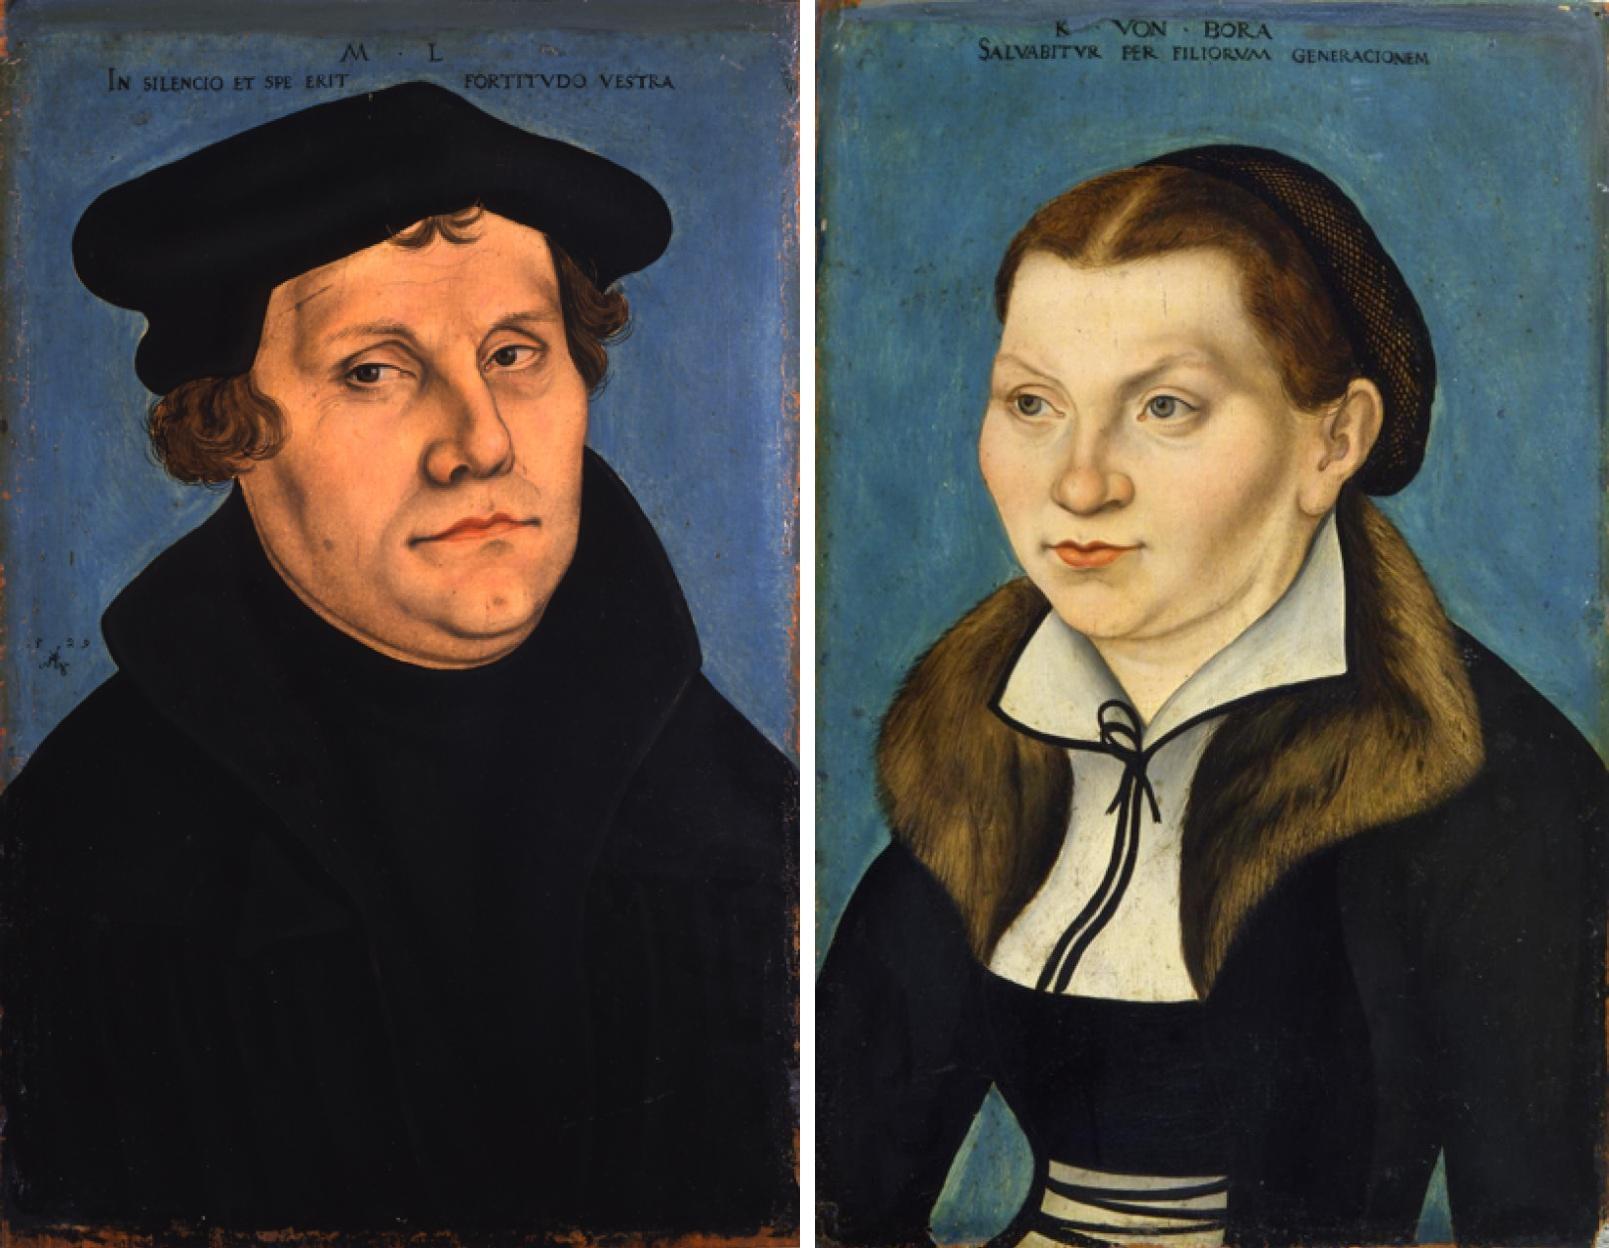 Lucas_Cranach_d.Ä._-_Doppelporträt_Martin_Luther_u._Katharina_Bora_(Museo_Poldi_Pezzoli)